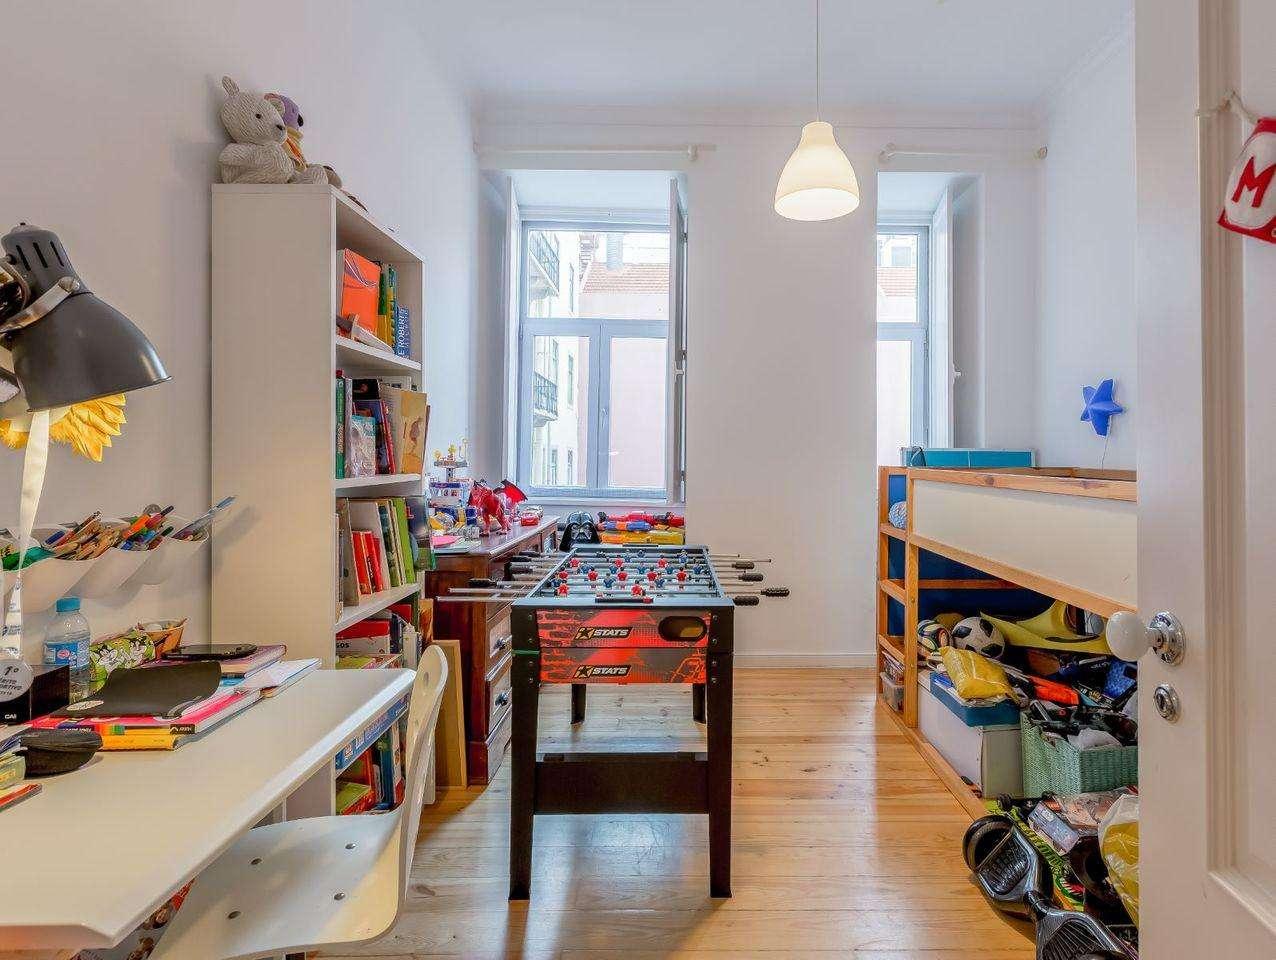 Apartamento para comprar, Santa Clara, Lisboa - Foto 8